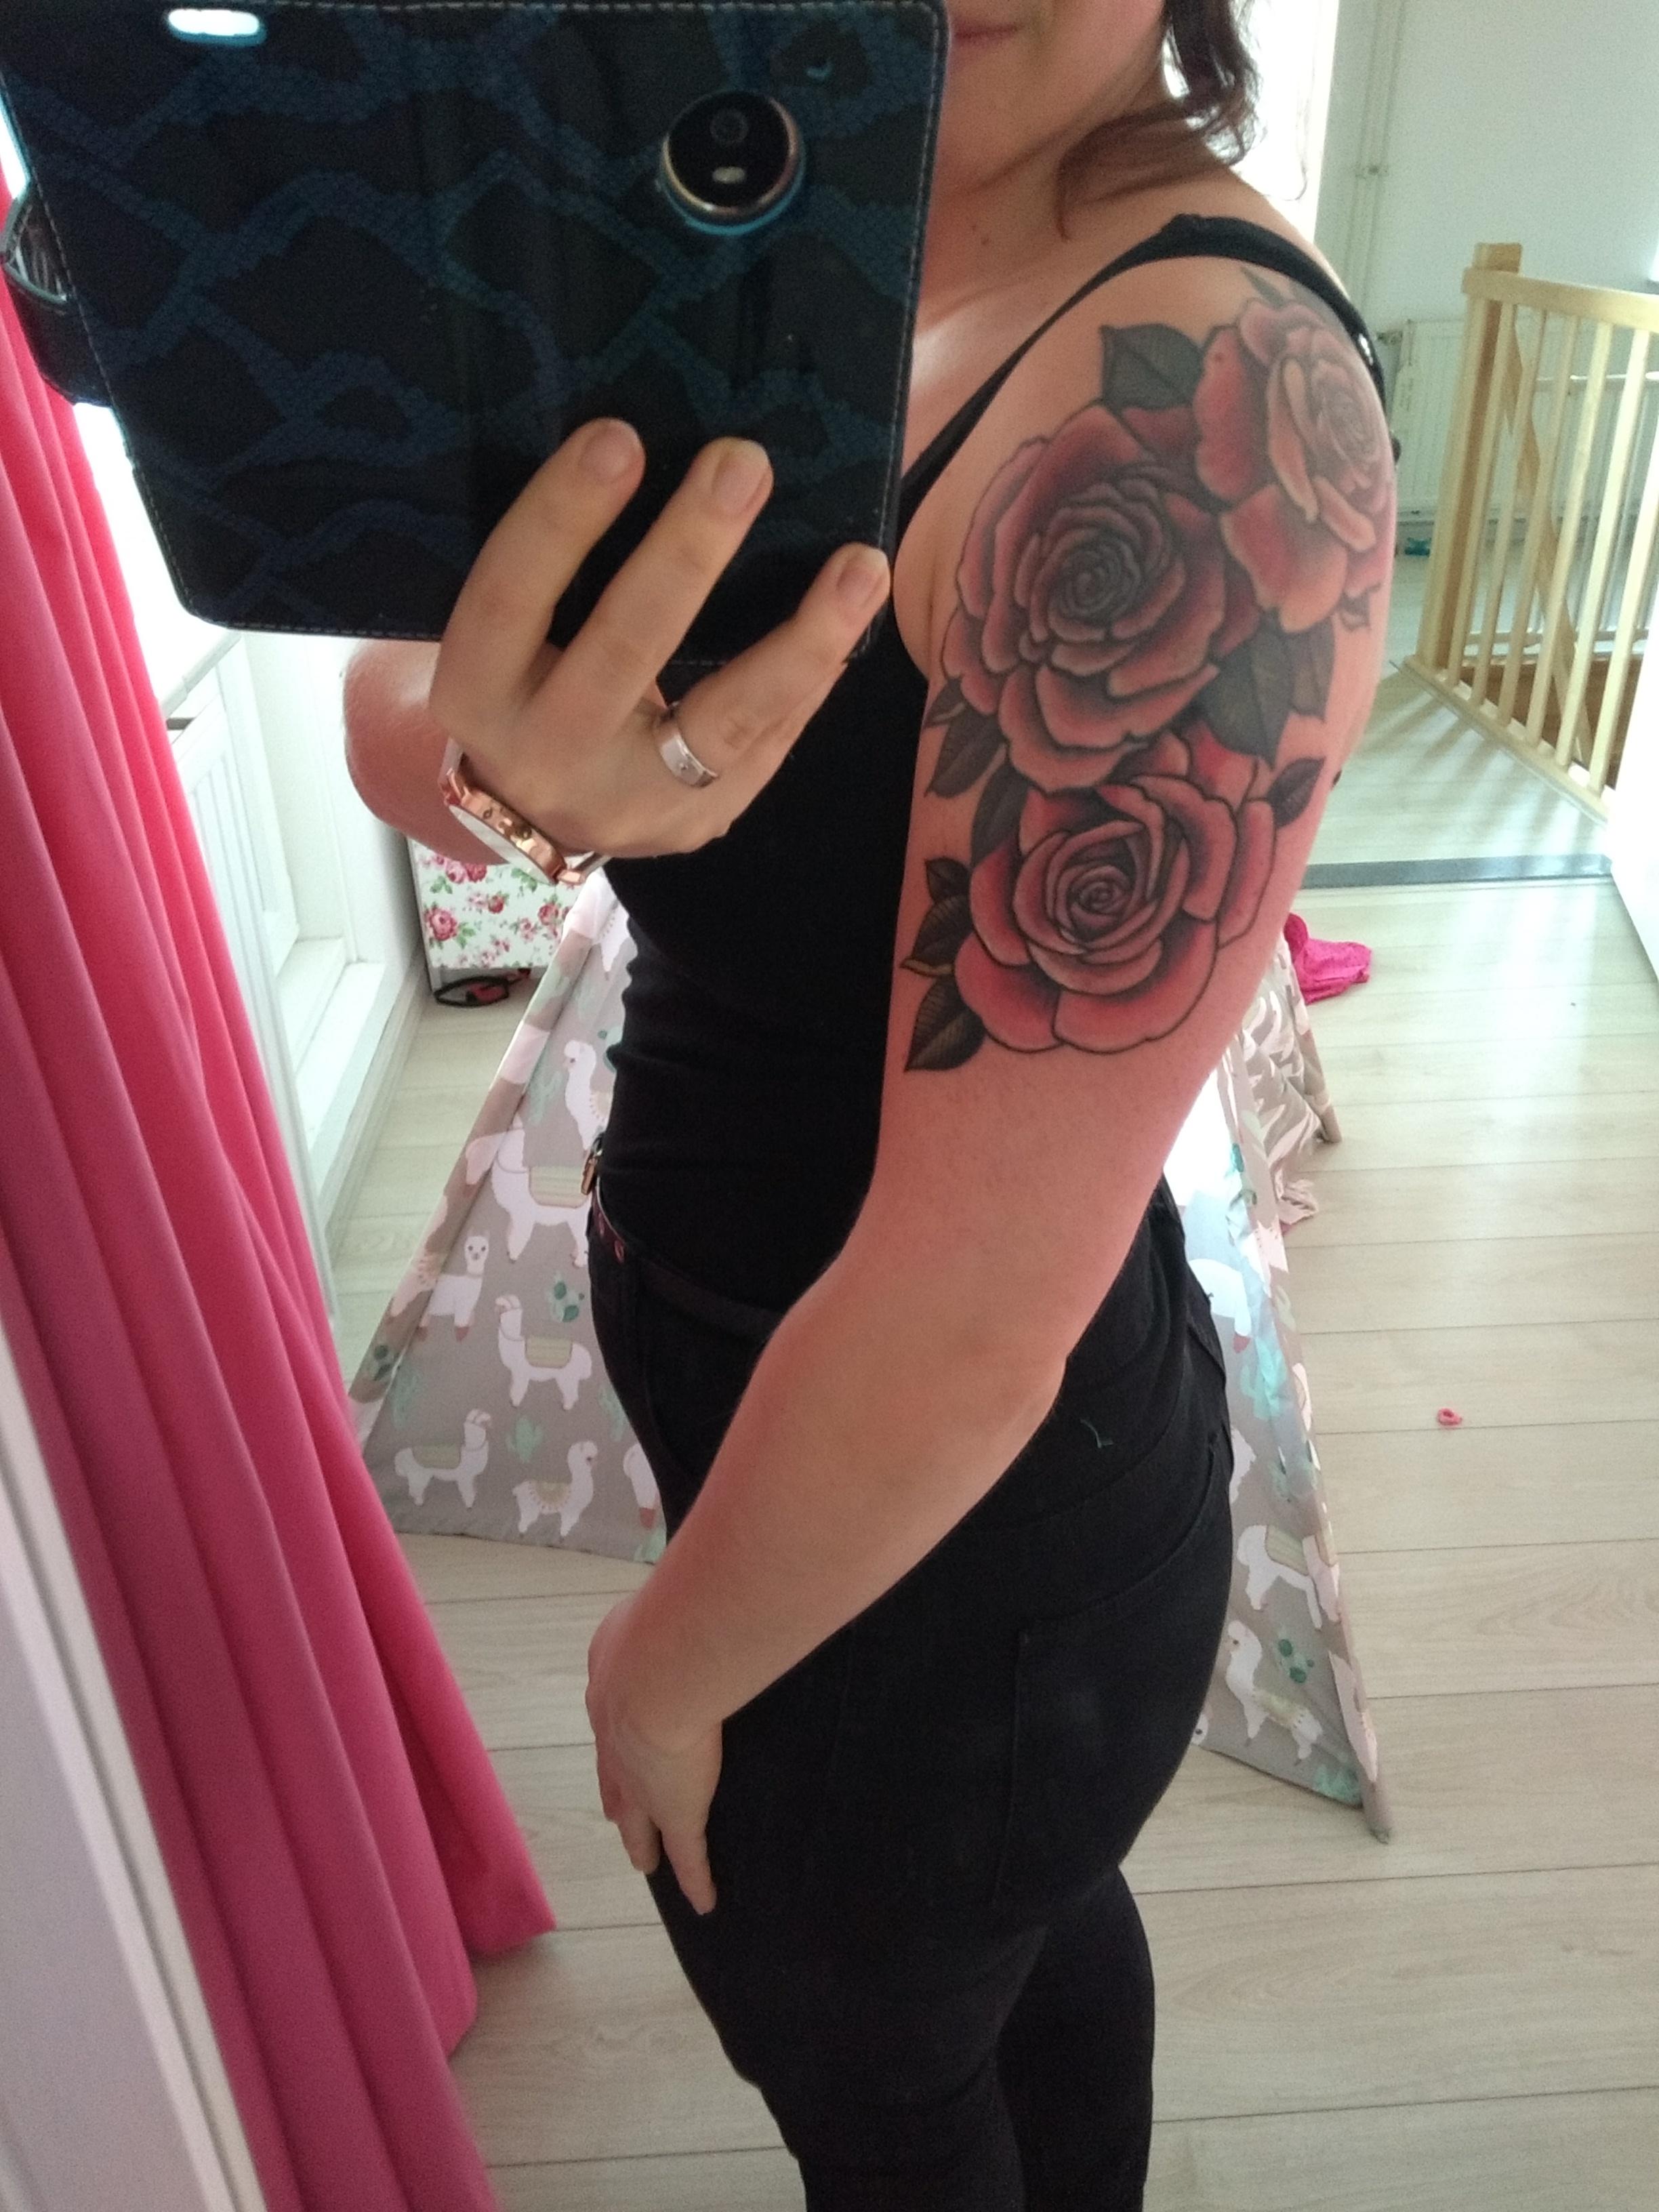 tattoo, cover-up, cover up, rozen, rozentattoo, rose tattoo, roses, ink, blog, blog tattoo, heretic tattoo, mamablog, momlife, momblog, lalog.nl, lalog, lalgblog